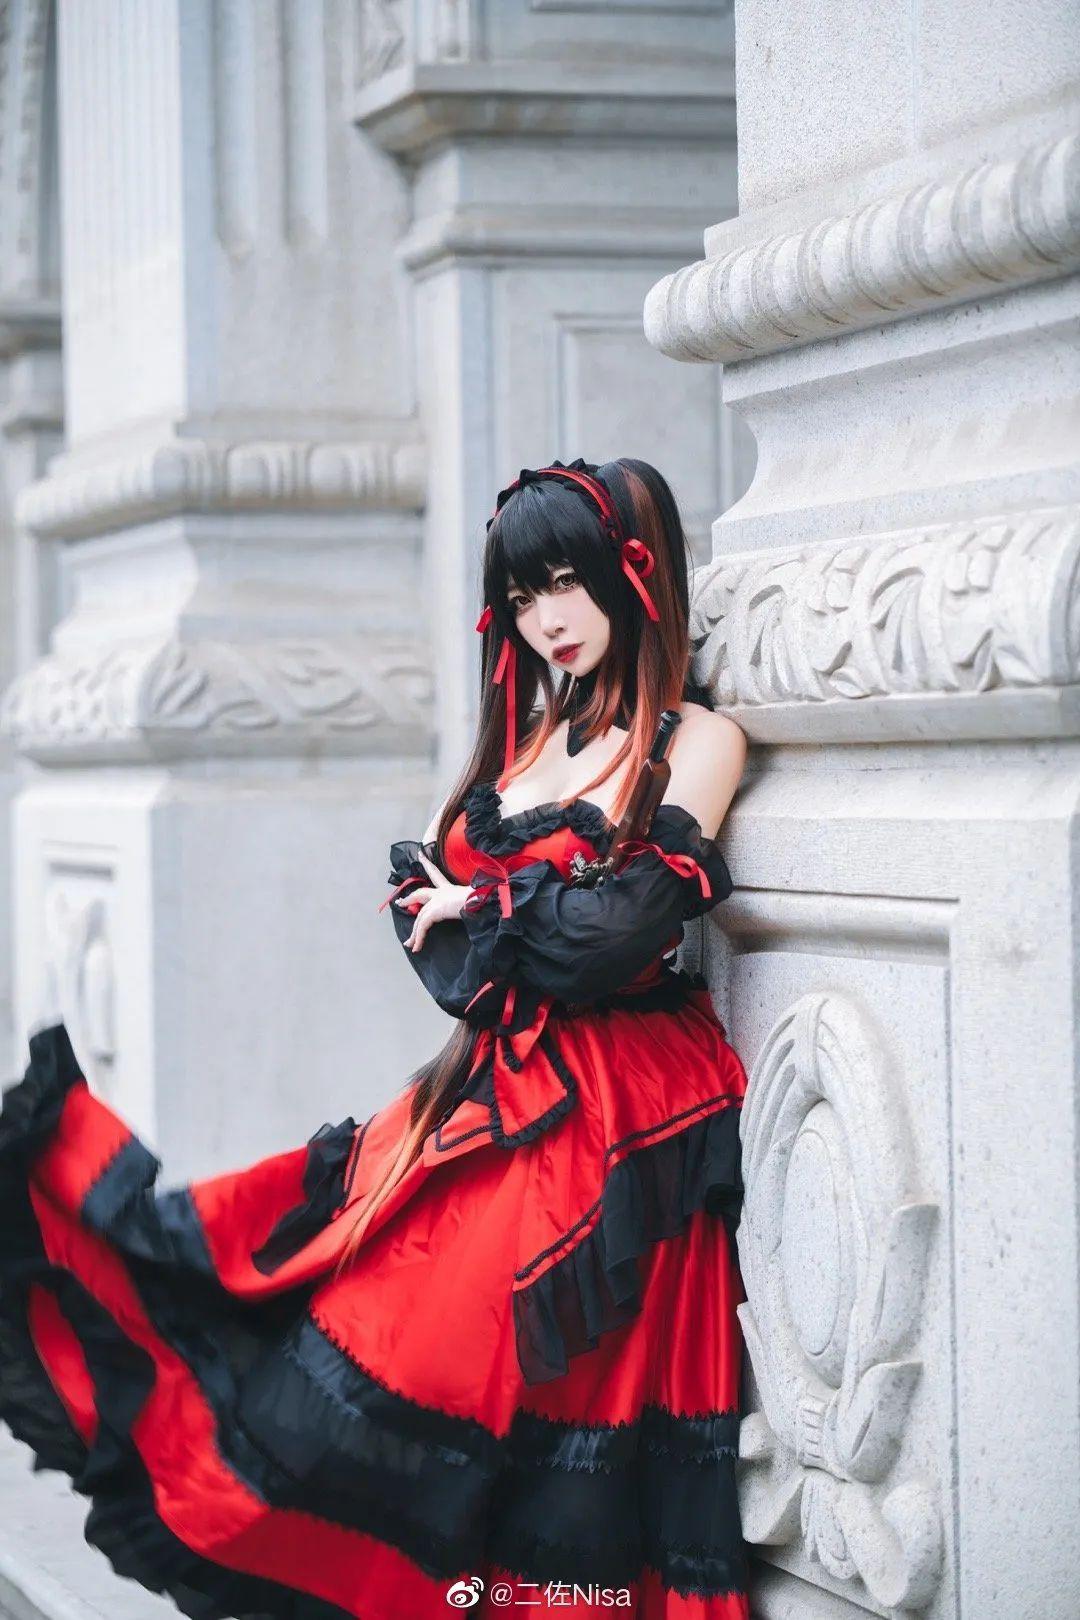 cosplay – 《约会大作战》时崎狂三,持枪的三三太A了 (cn:二佐Nisa)_图片 No.5